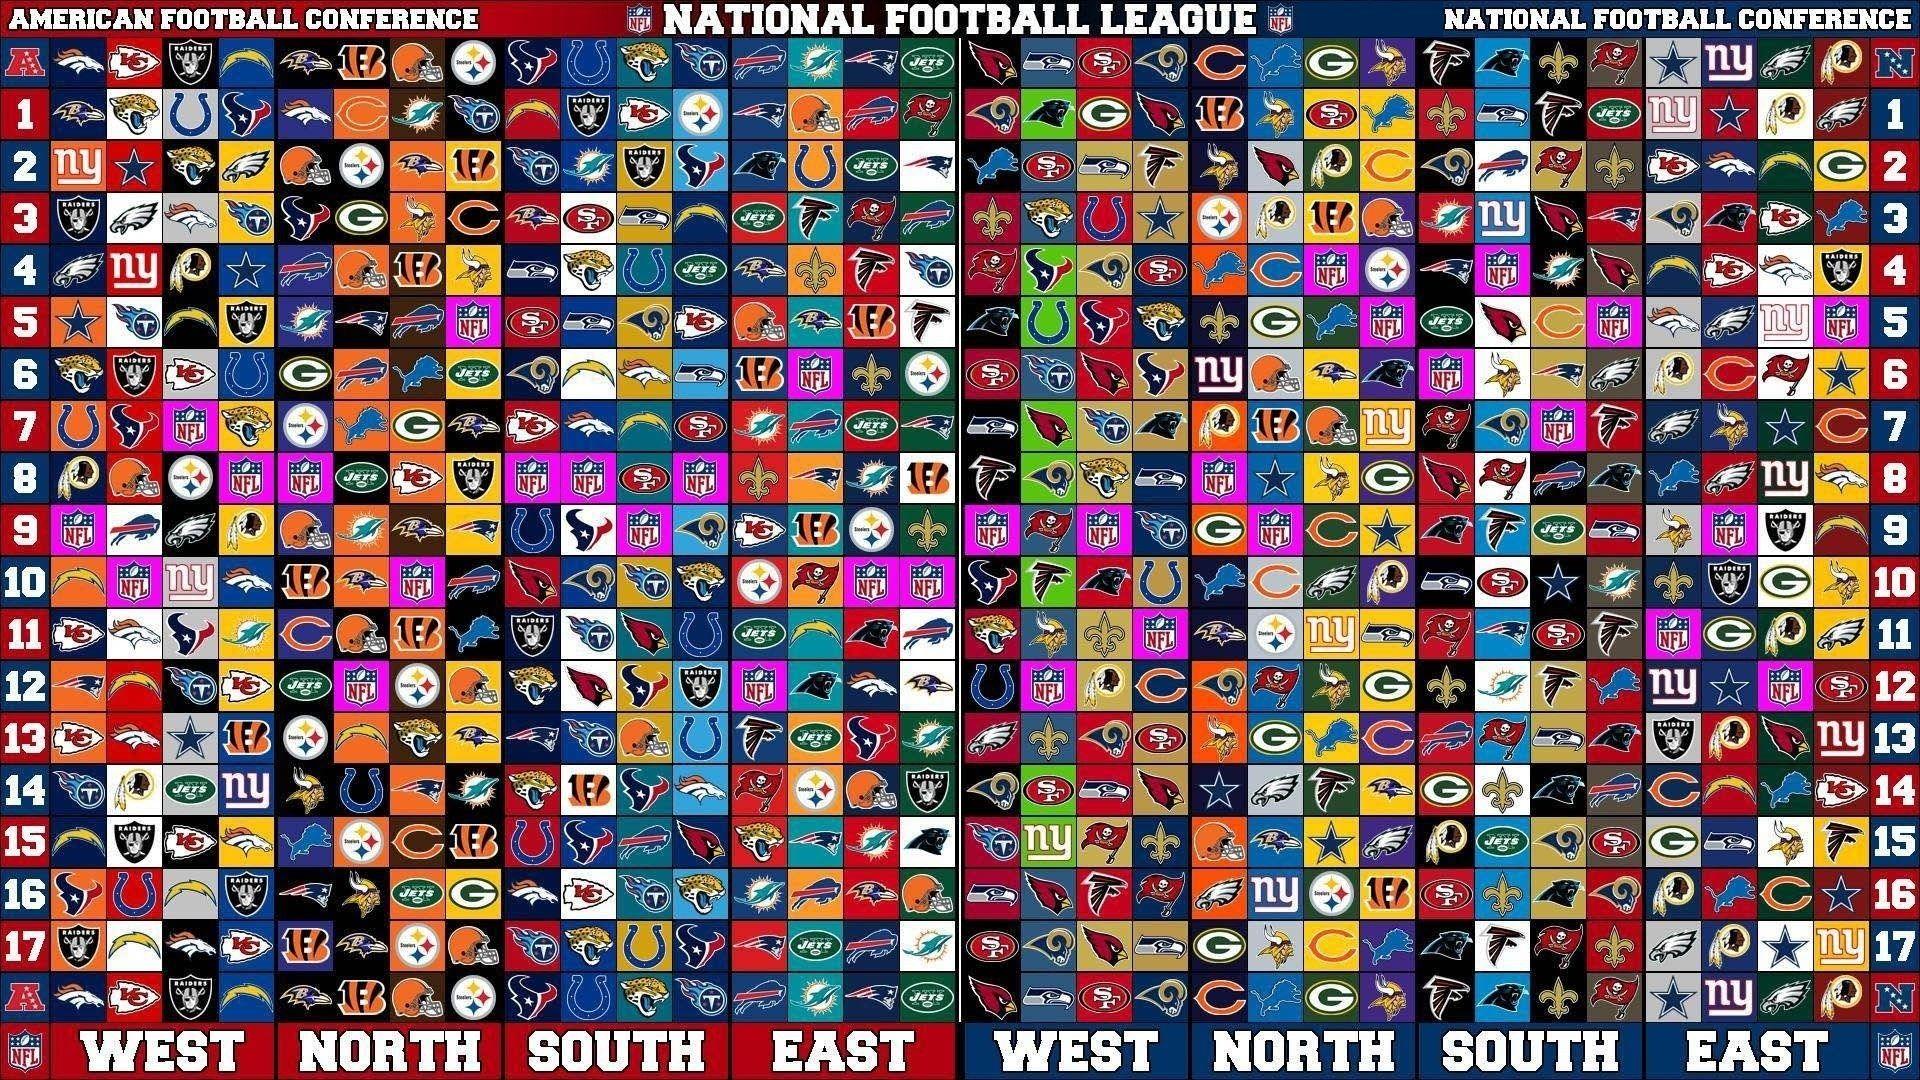 Nfl Teams Wallpaper Hd 2020 Nfl Football Wallpapers Nfl Game Schedule Nfl Football Wallpaper Nfl Games